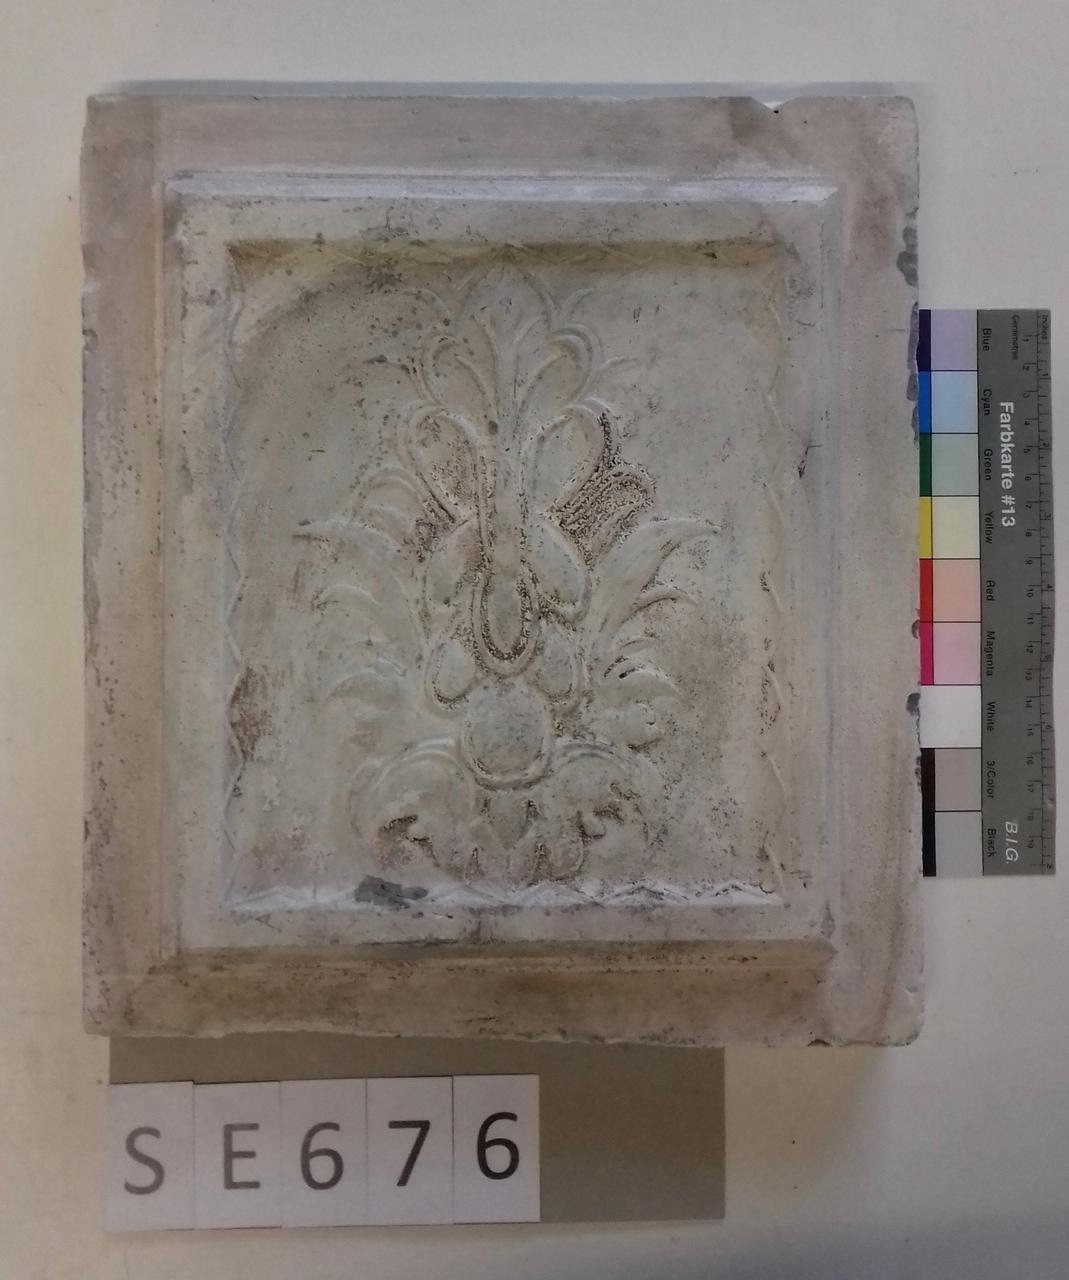 Mutterform ledige Kachel mit floralem Motiv